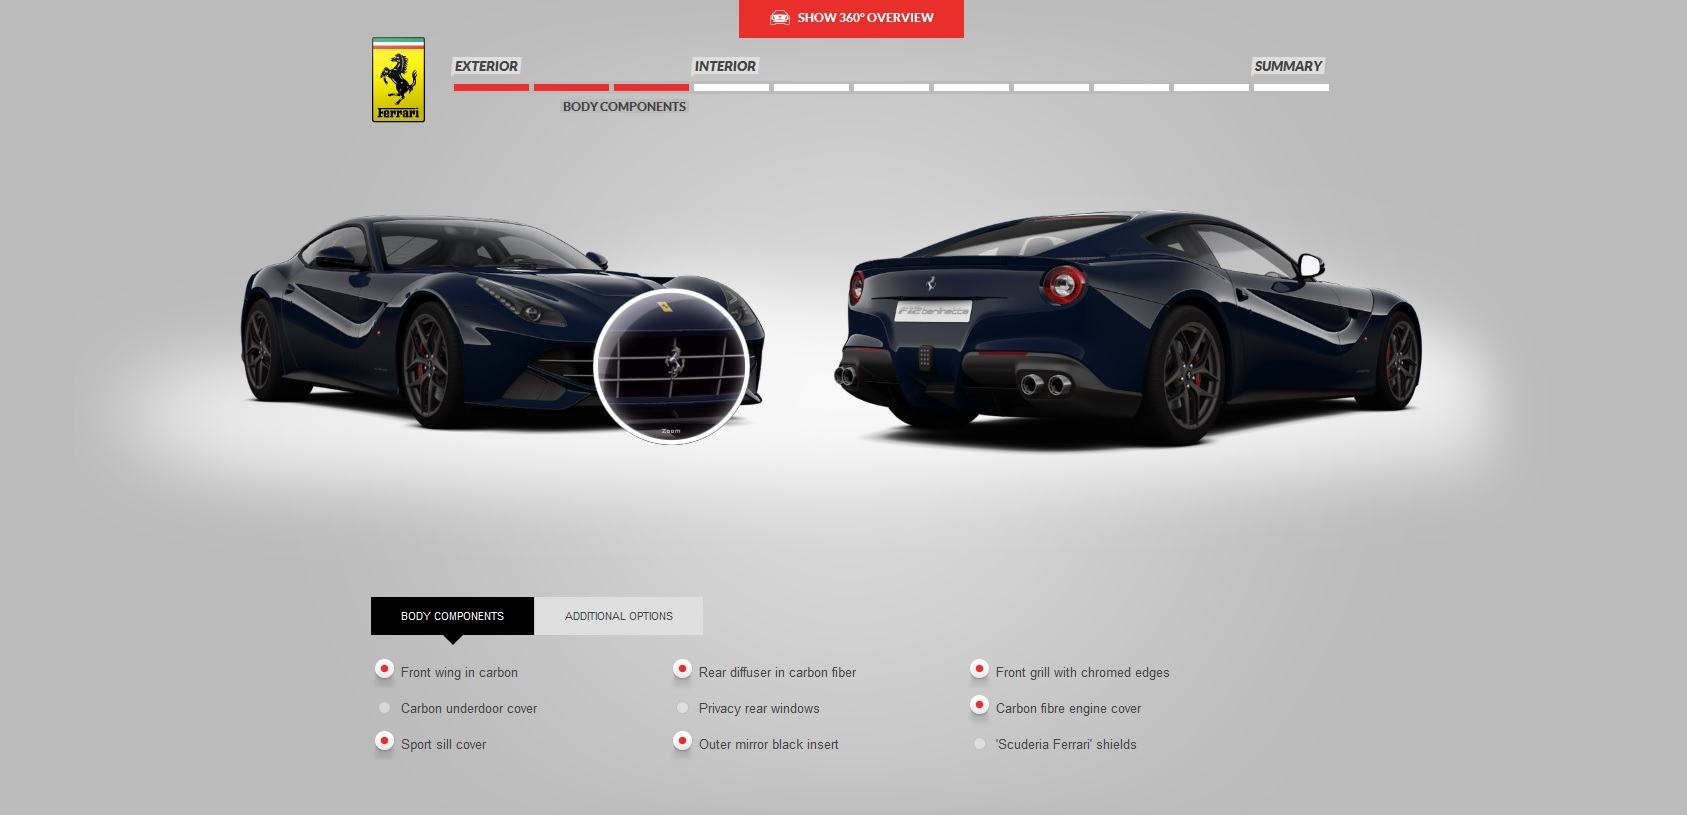 Build Your Own Ferrari F12 Berlinetta Right Foot Down